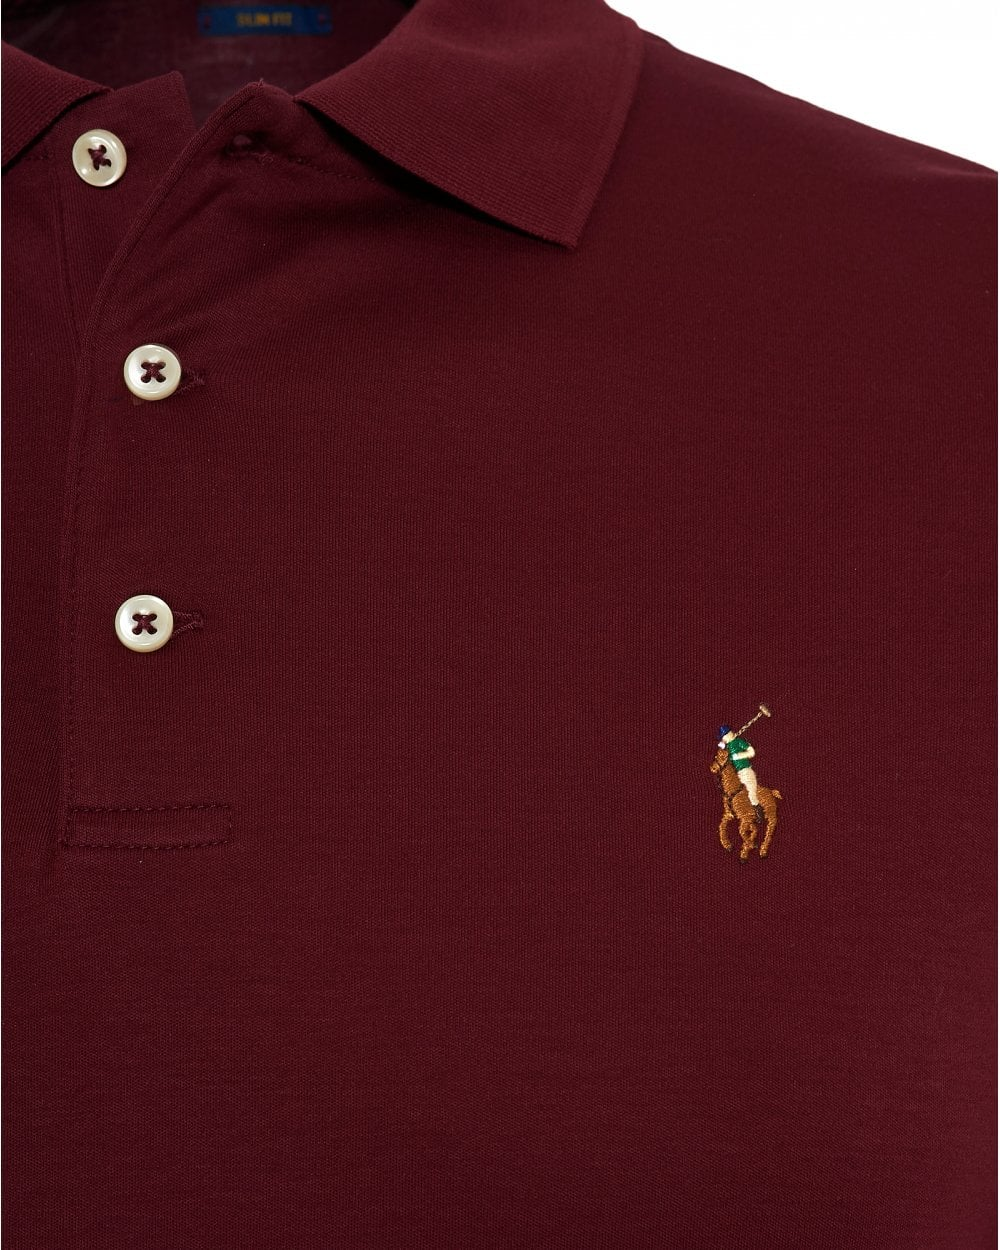 b65c96d5 Ralph Lauren Mens Pima Polo Shirt, Slim Fit Wine Red Polo